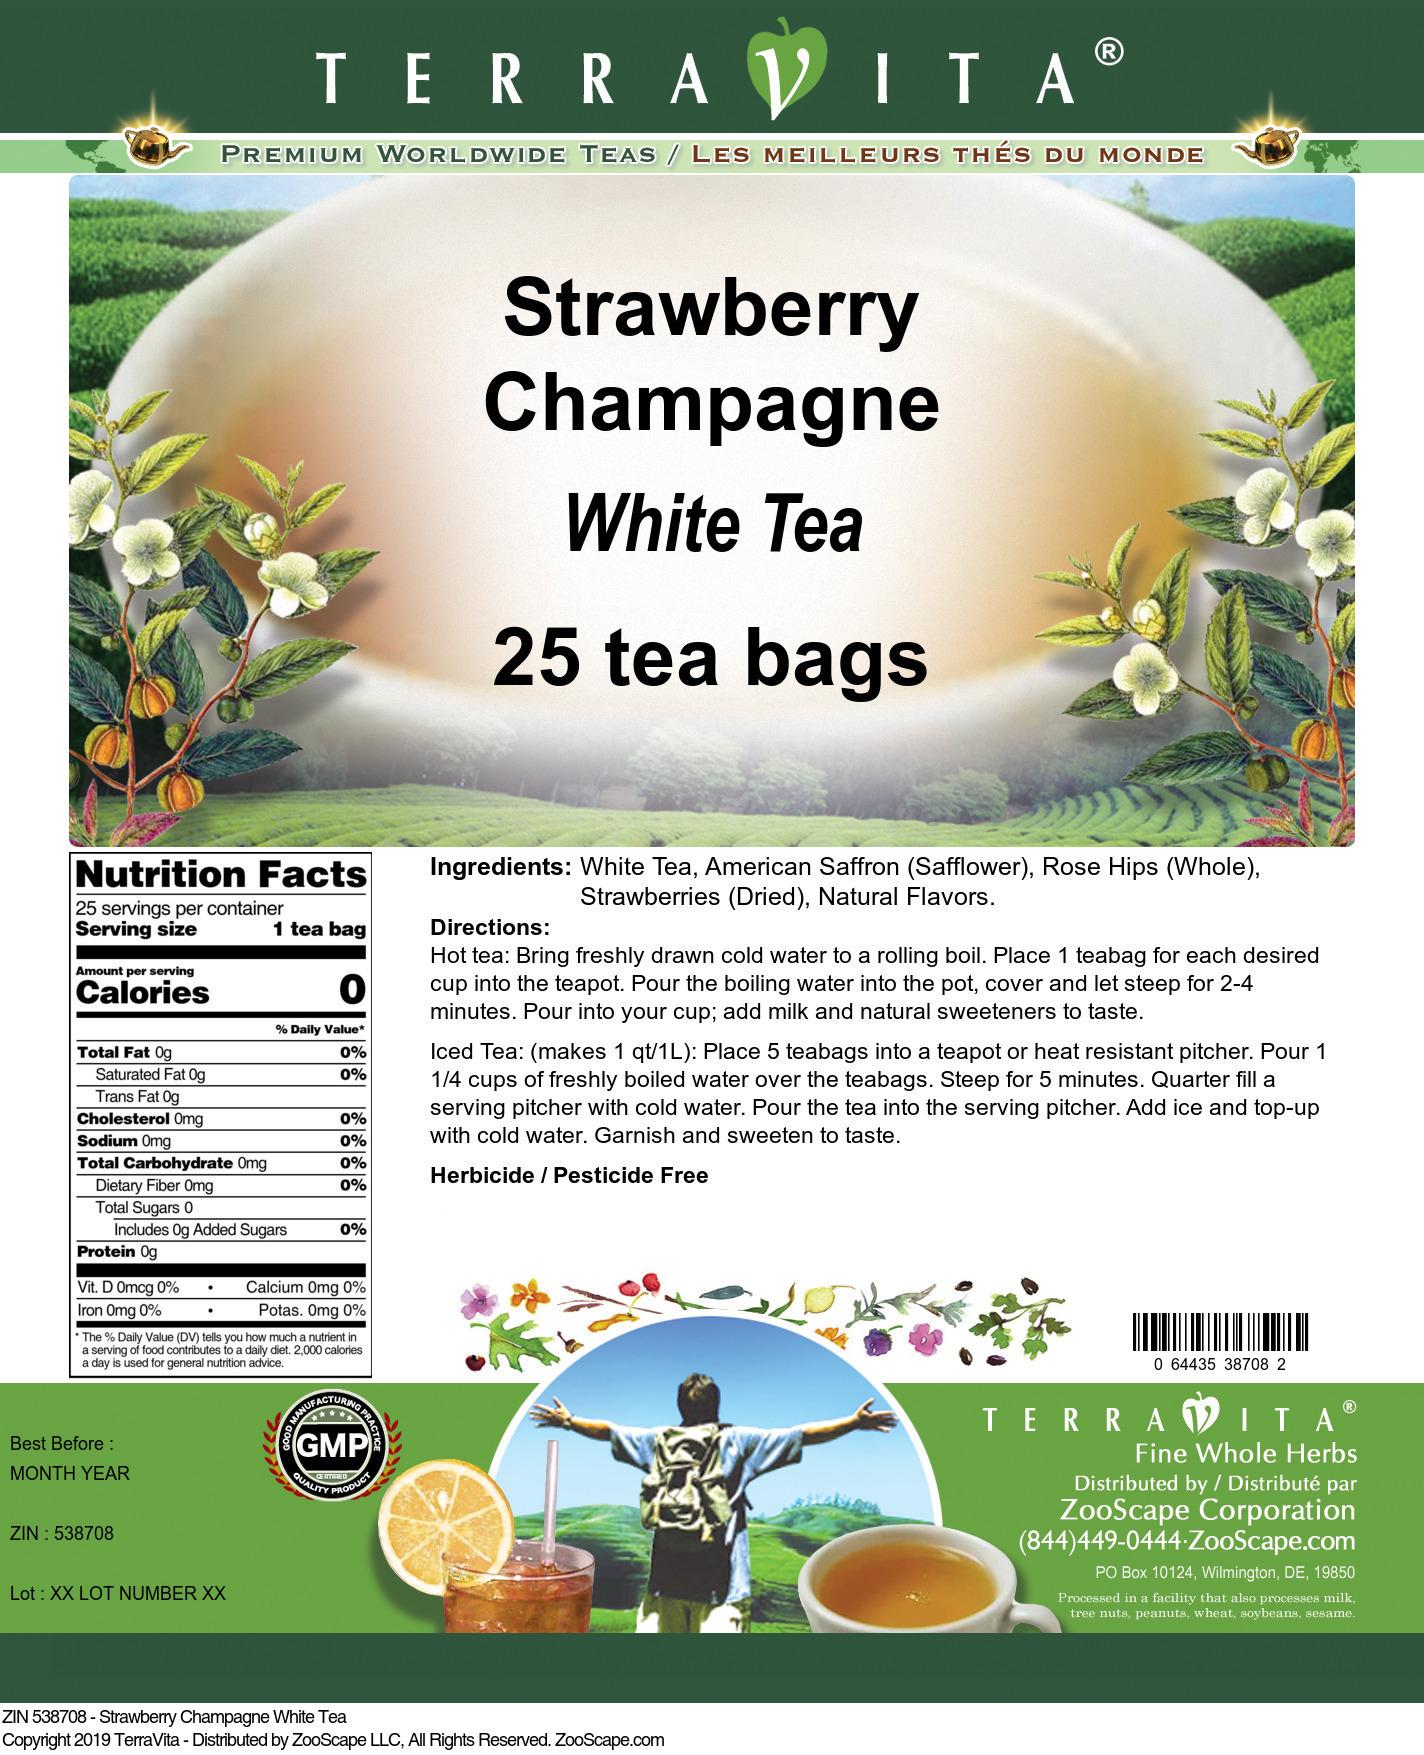 Strawberry Champagne White Tea